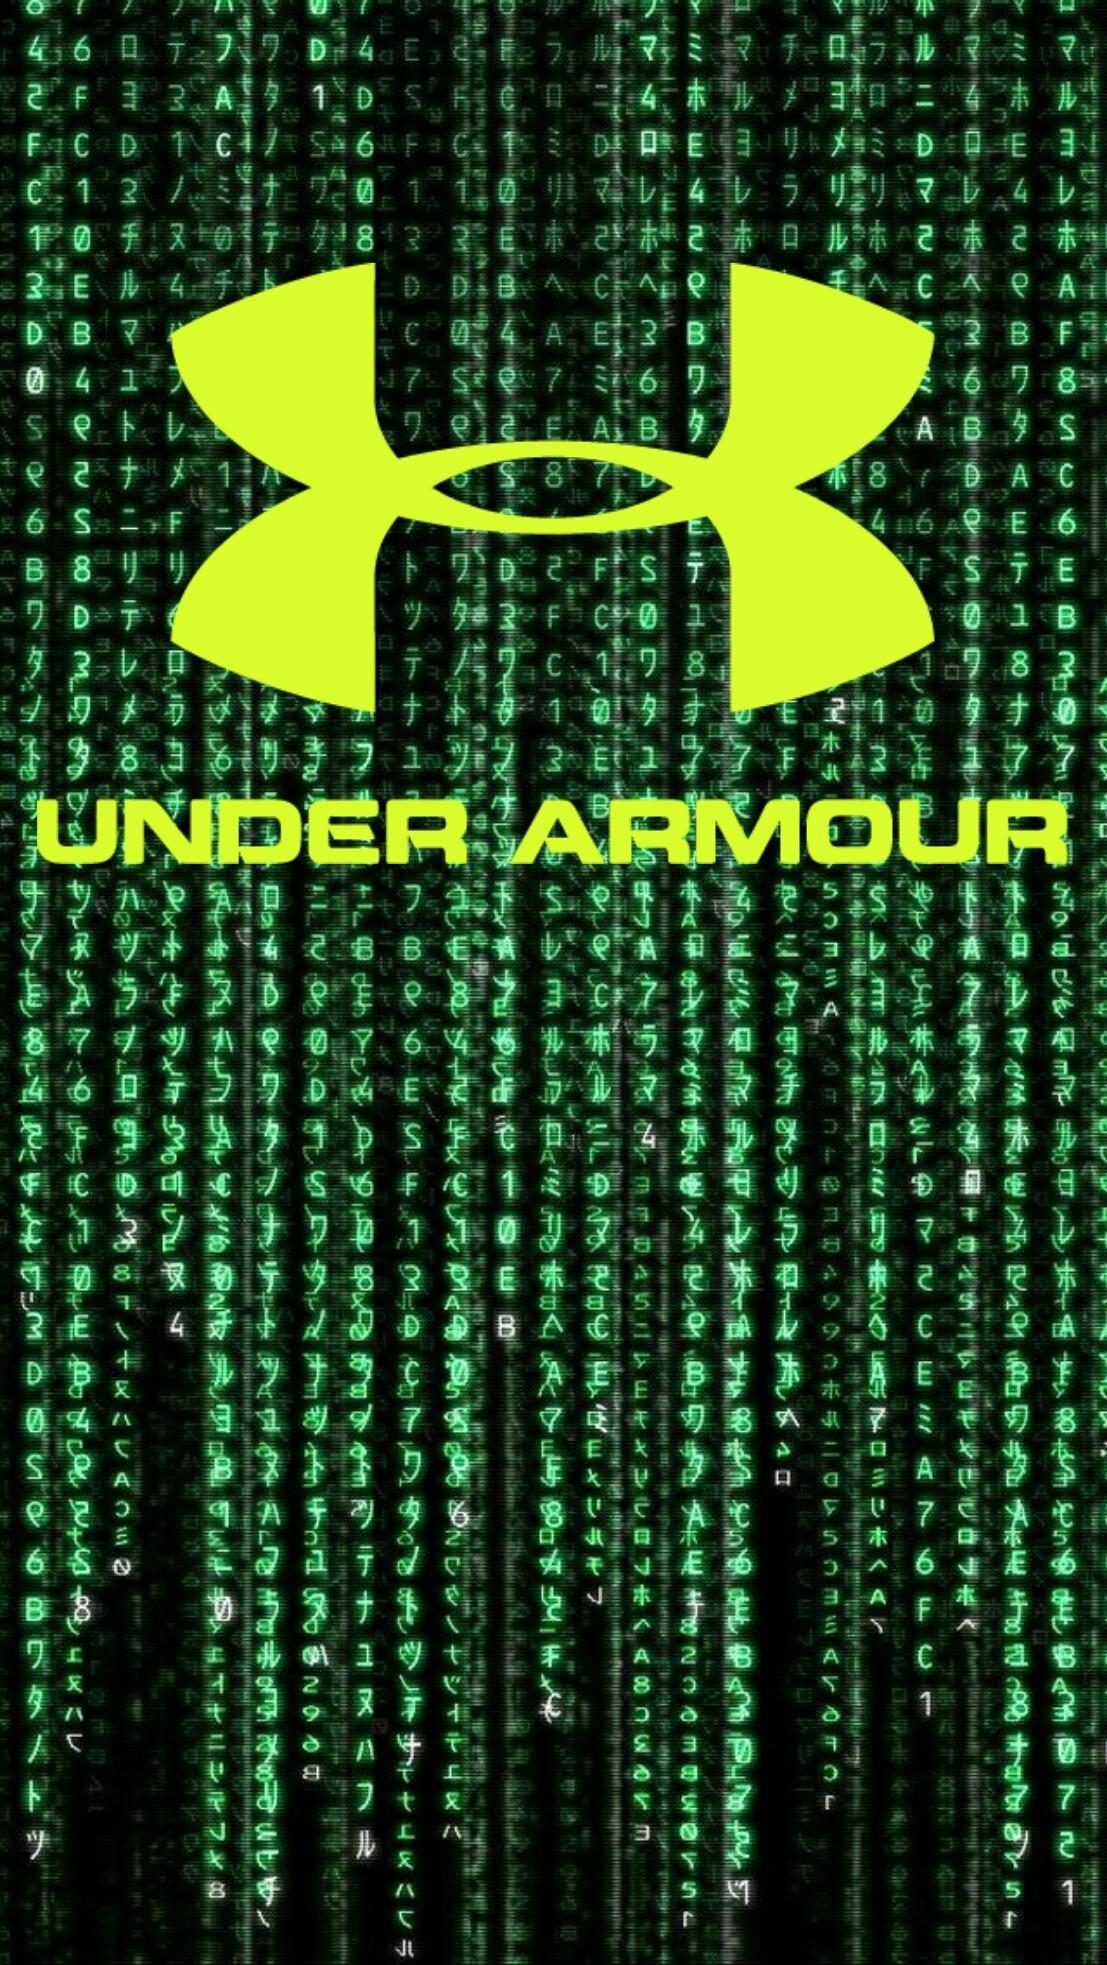 Under Armour Wallpaper...